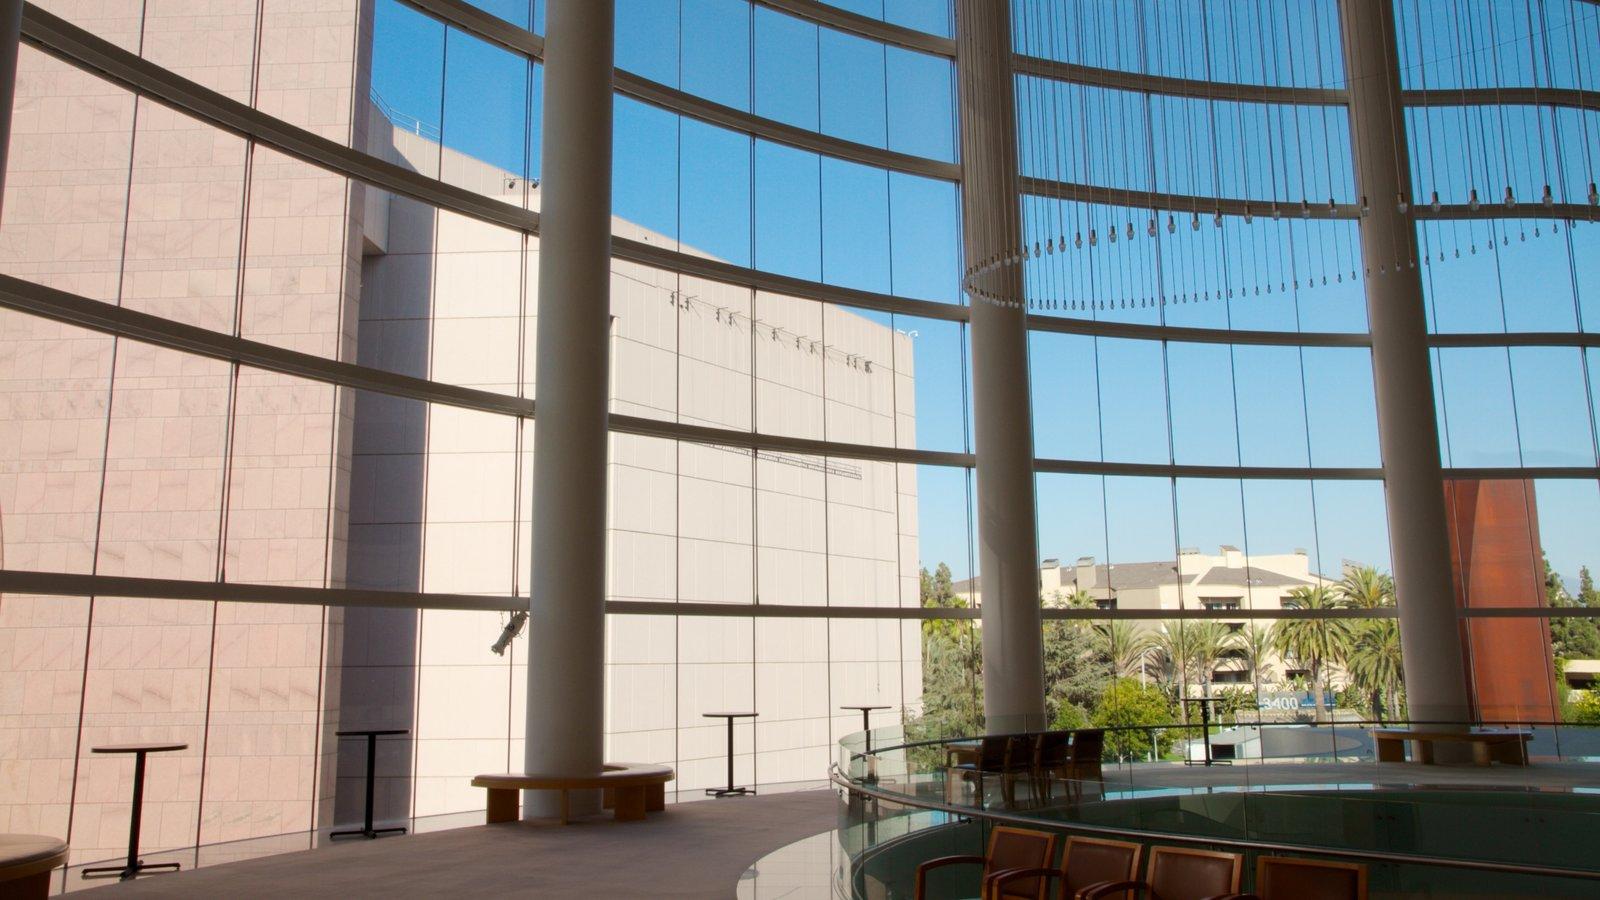 Segerstrom Center for the Arts ofreciendo vistas interiores y arquitectura moderna